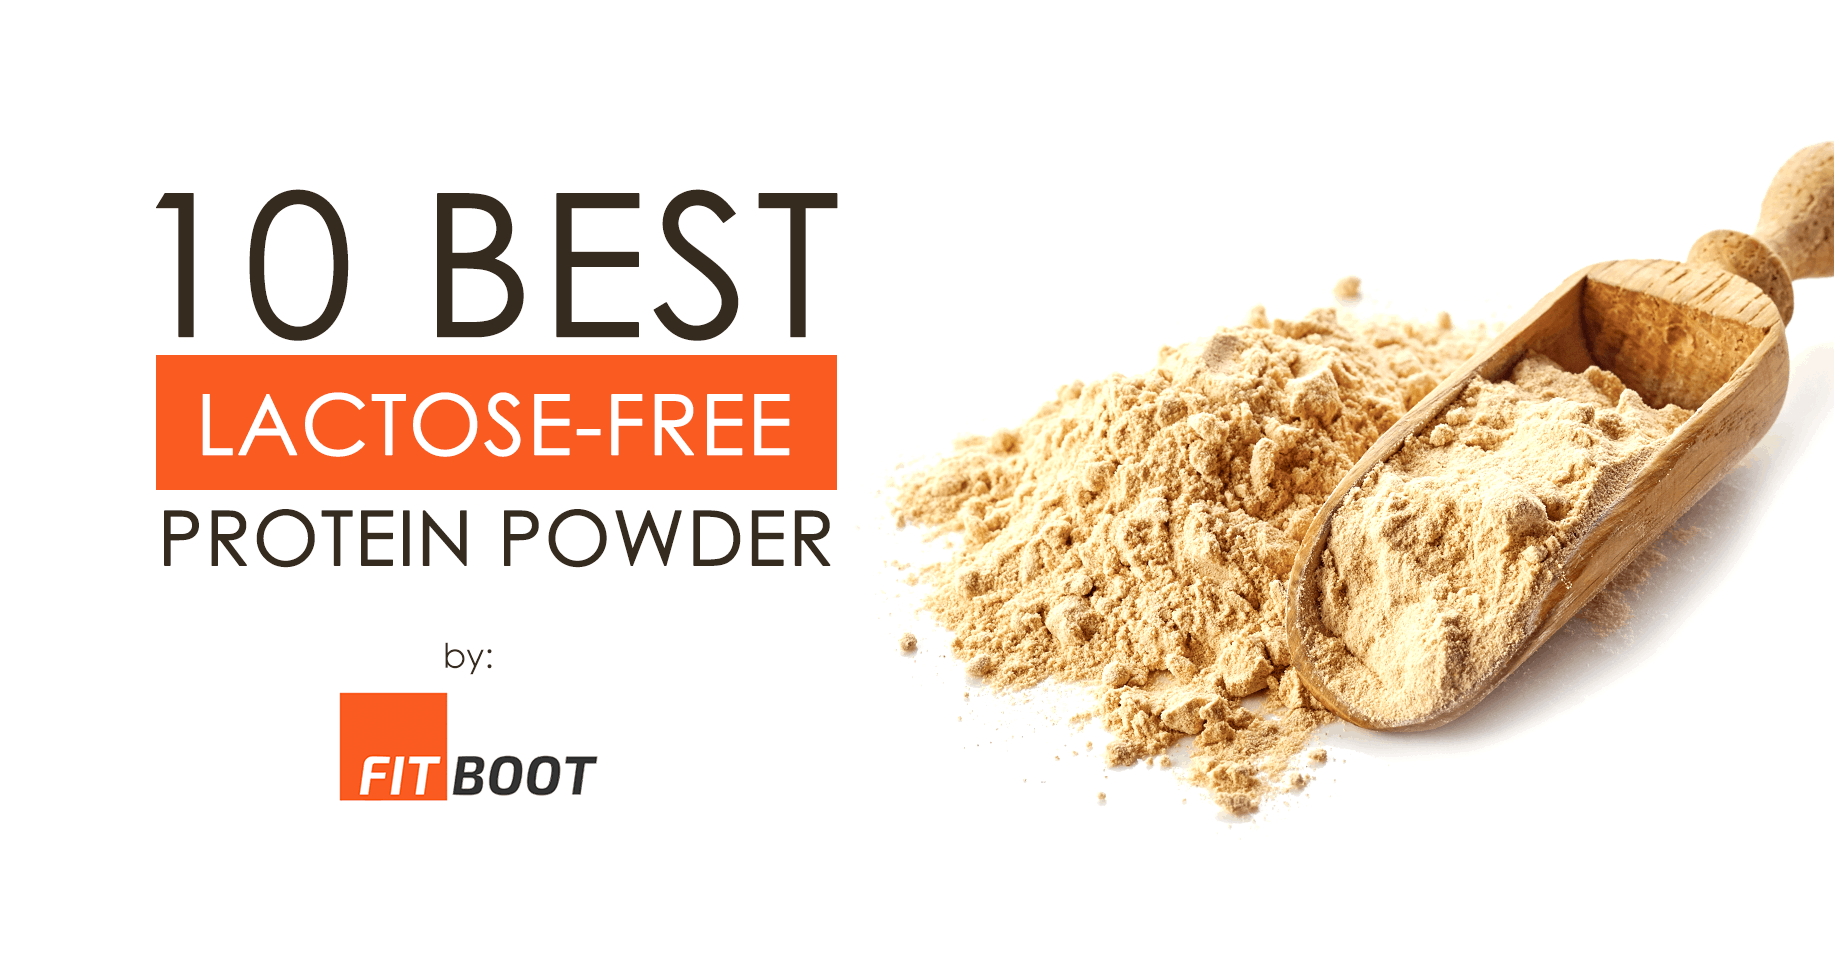 10 Best Lactose-Free Protein Powder